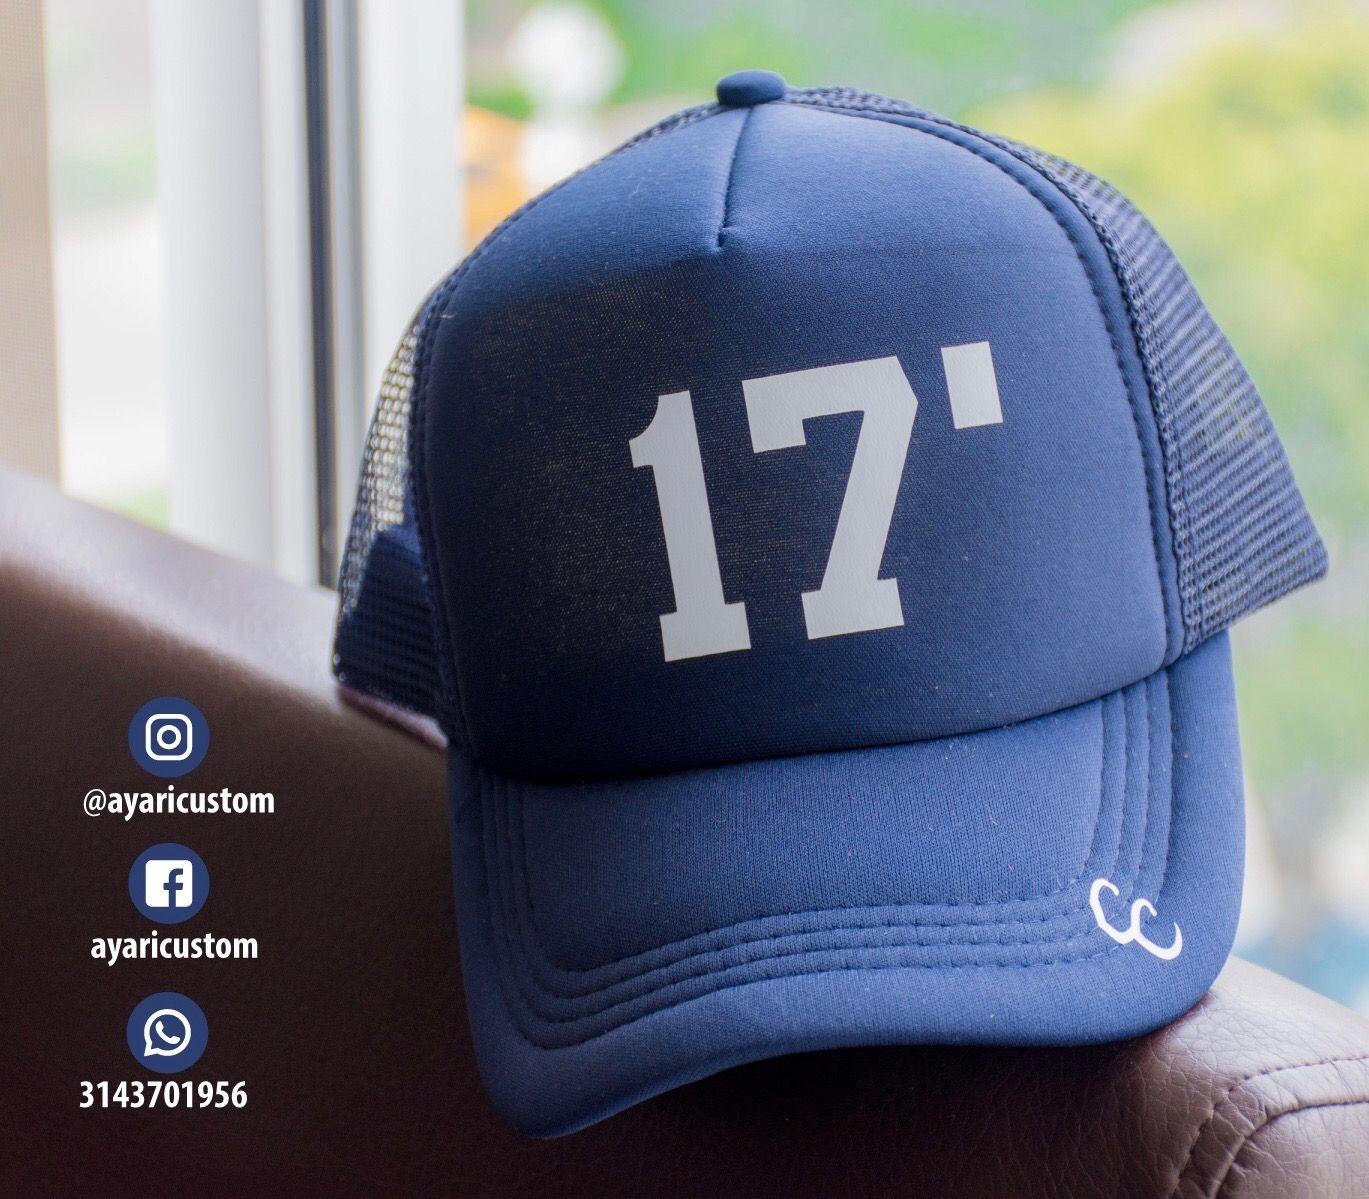 Gorras personalizadas en Bogotá 92c100a1b54